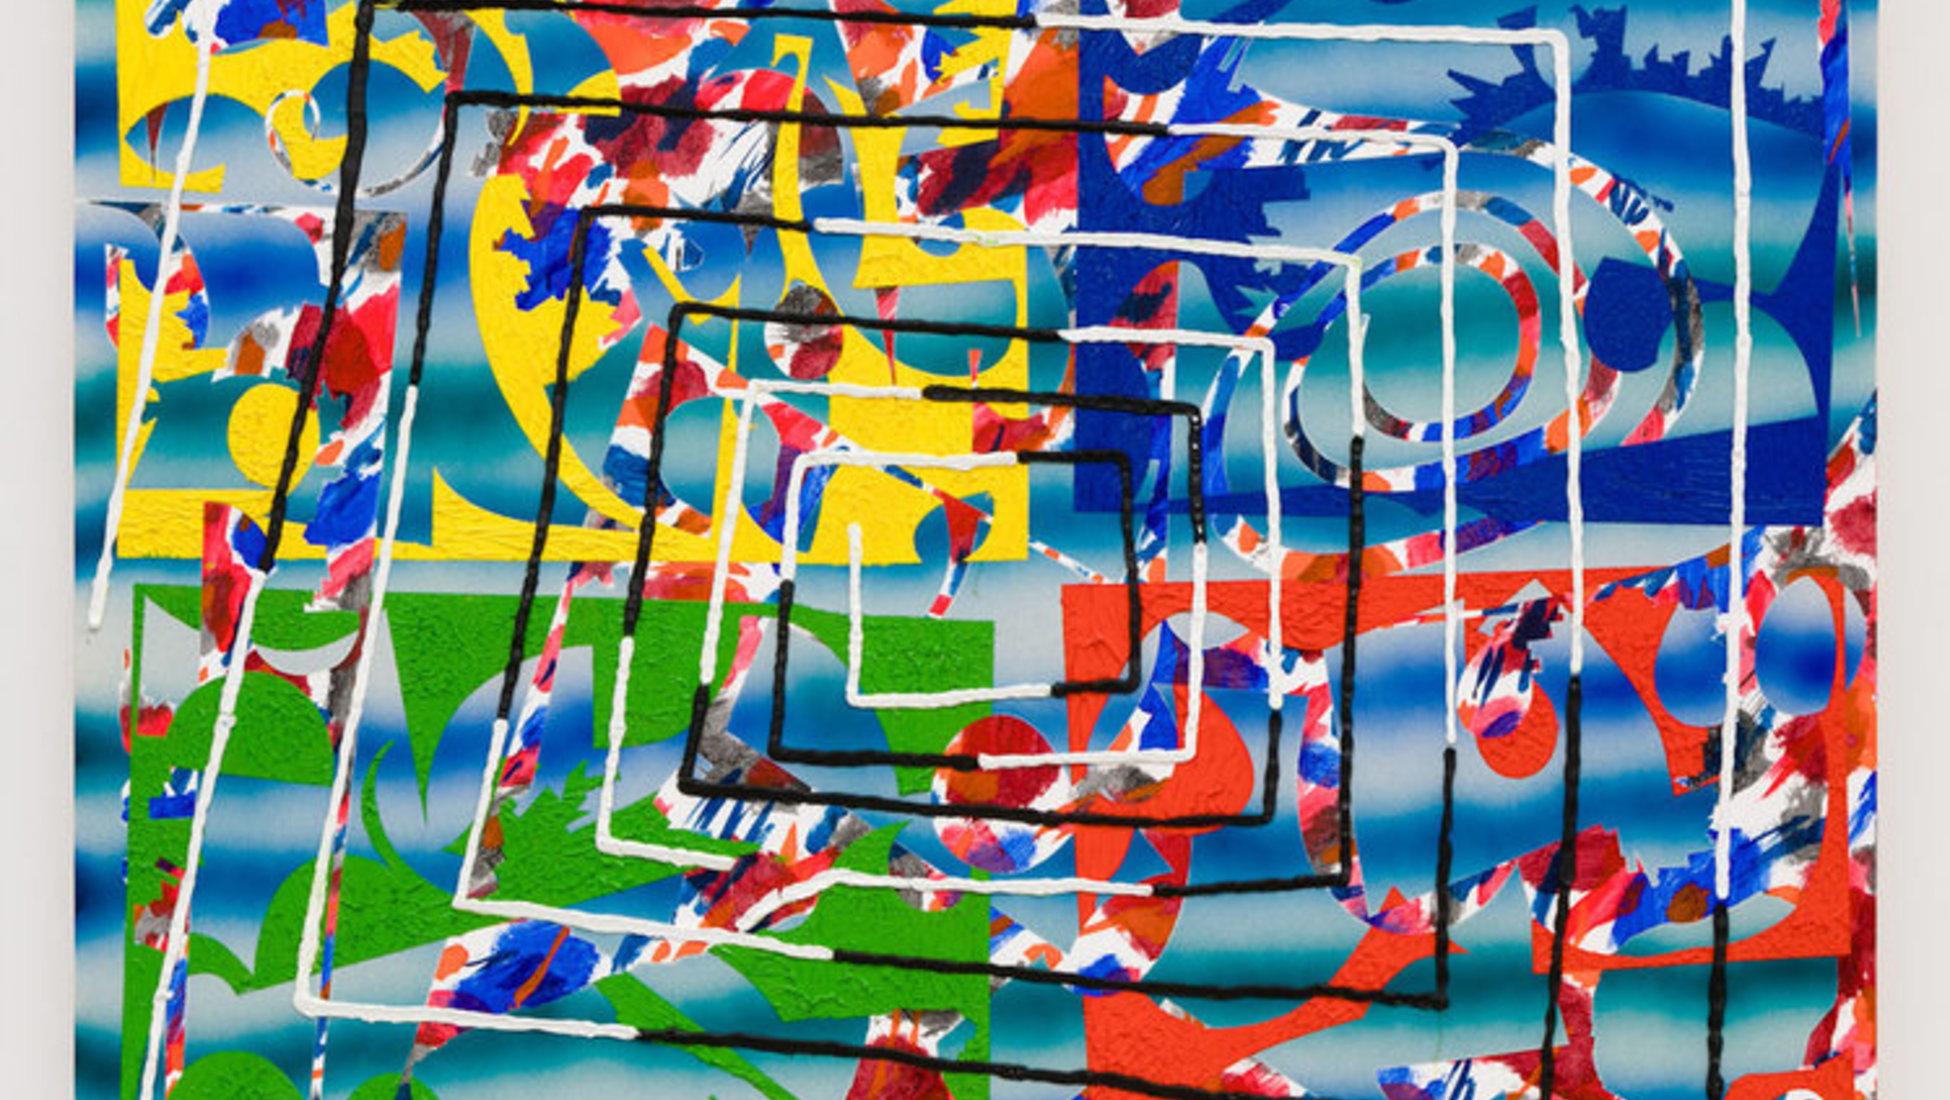 Genoeg 8 moderne kunstenaars waar je nu in moet investeren - Catawiki #XF67